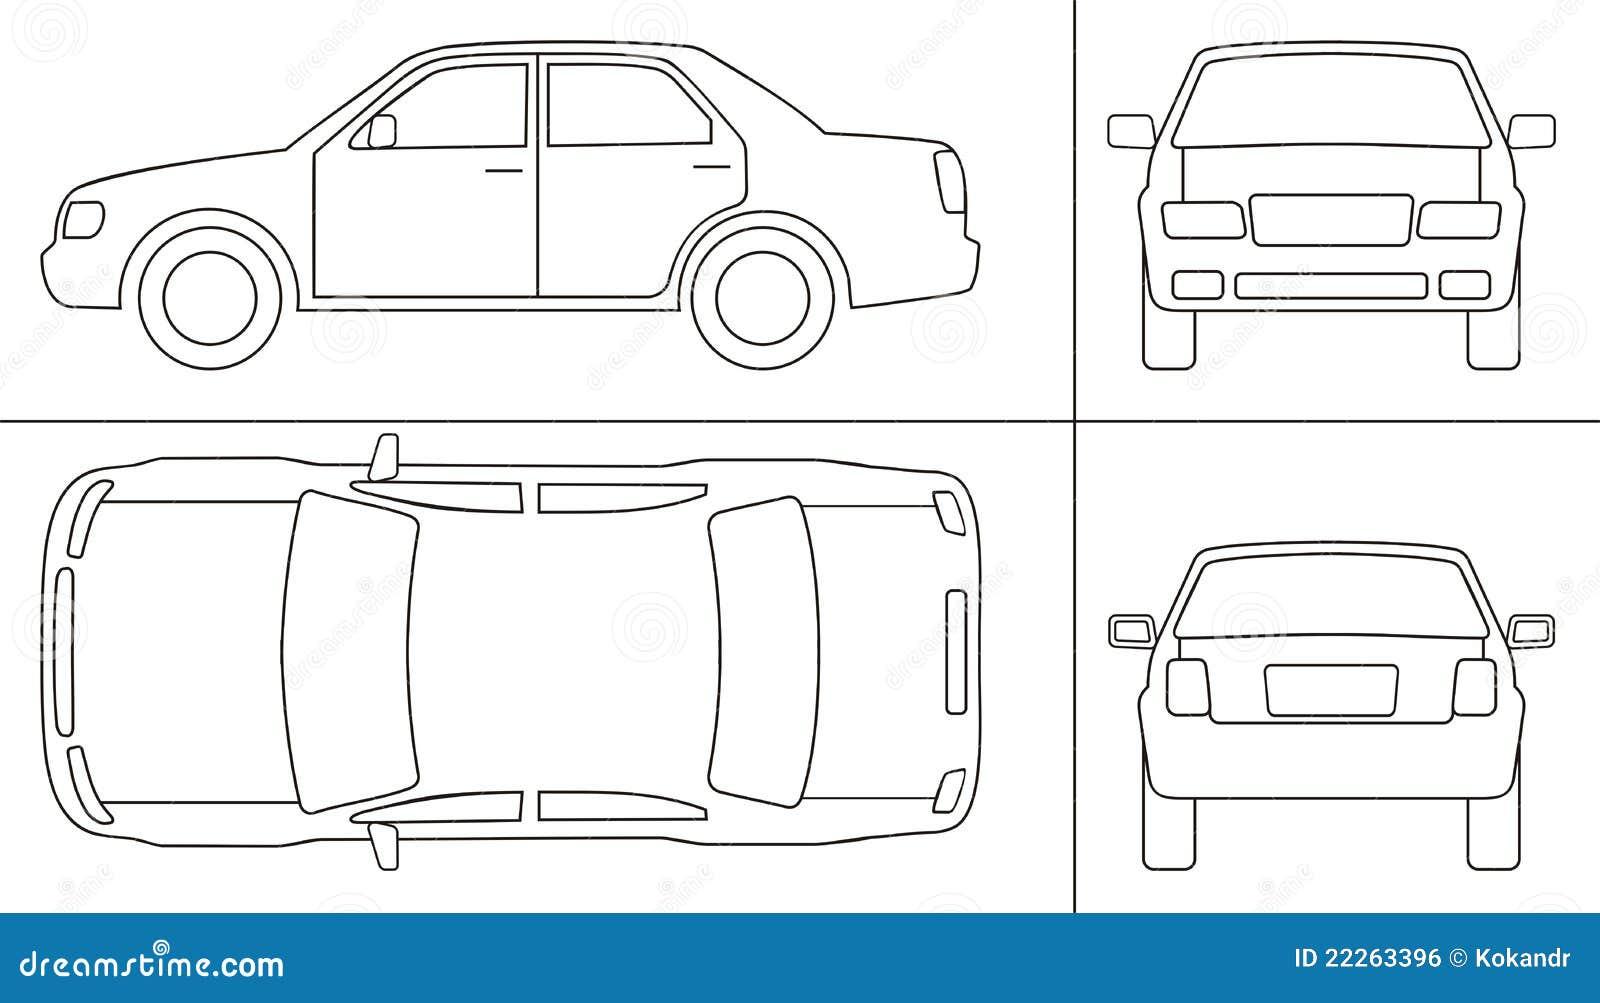 Car Drawing Top View